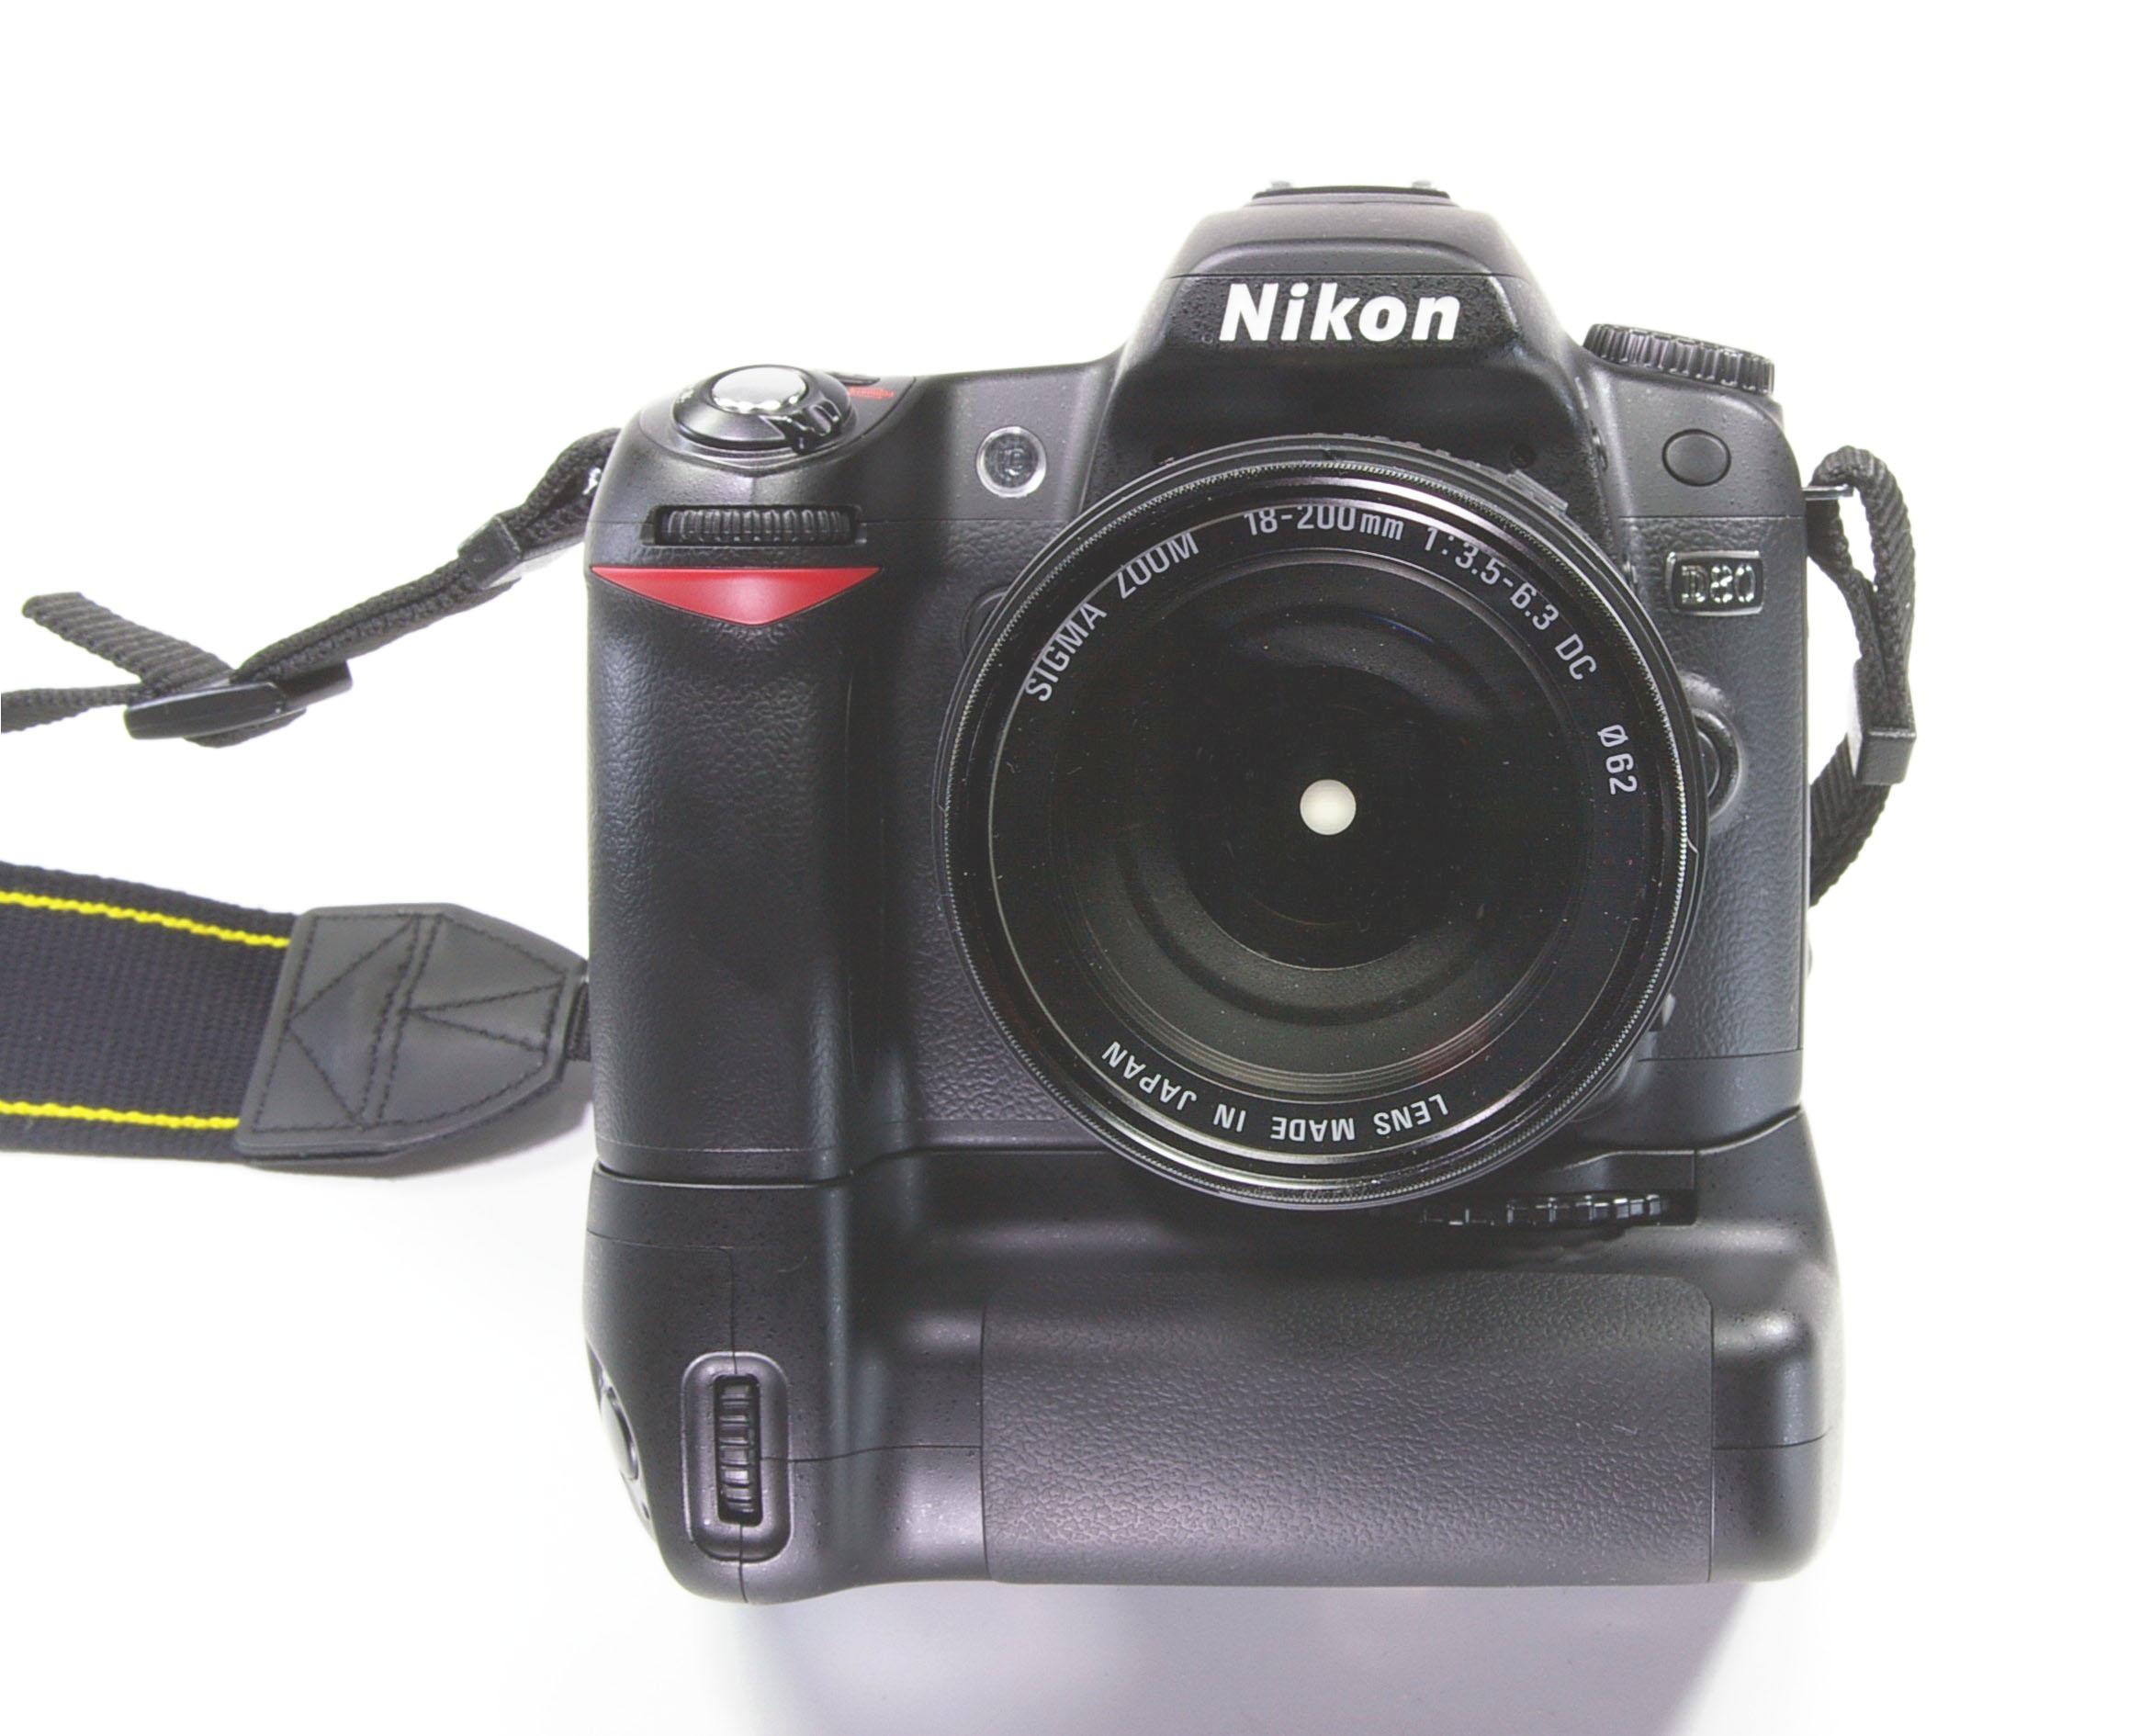 File:Nikon D80 Kamera....